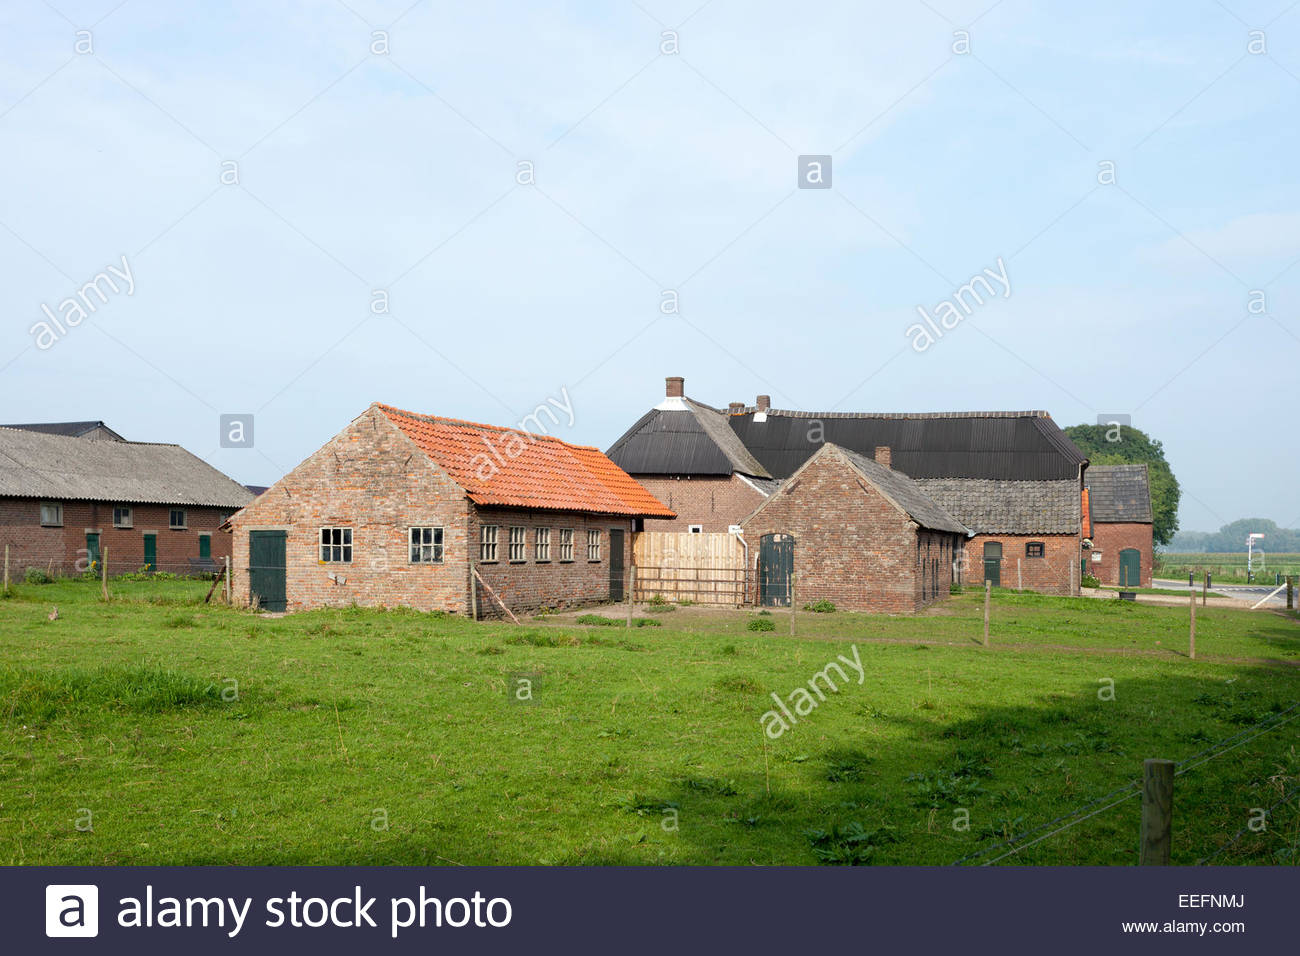 Farm near hernen in the netherlands in typical gelderse for Farm house netherlands